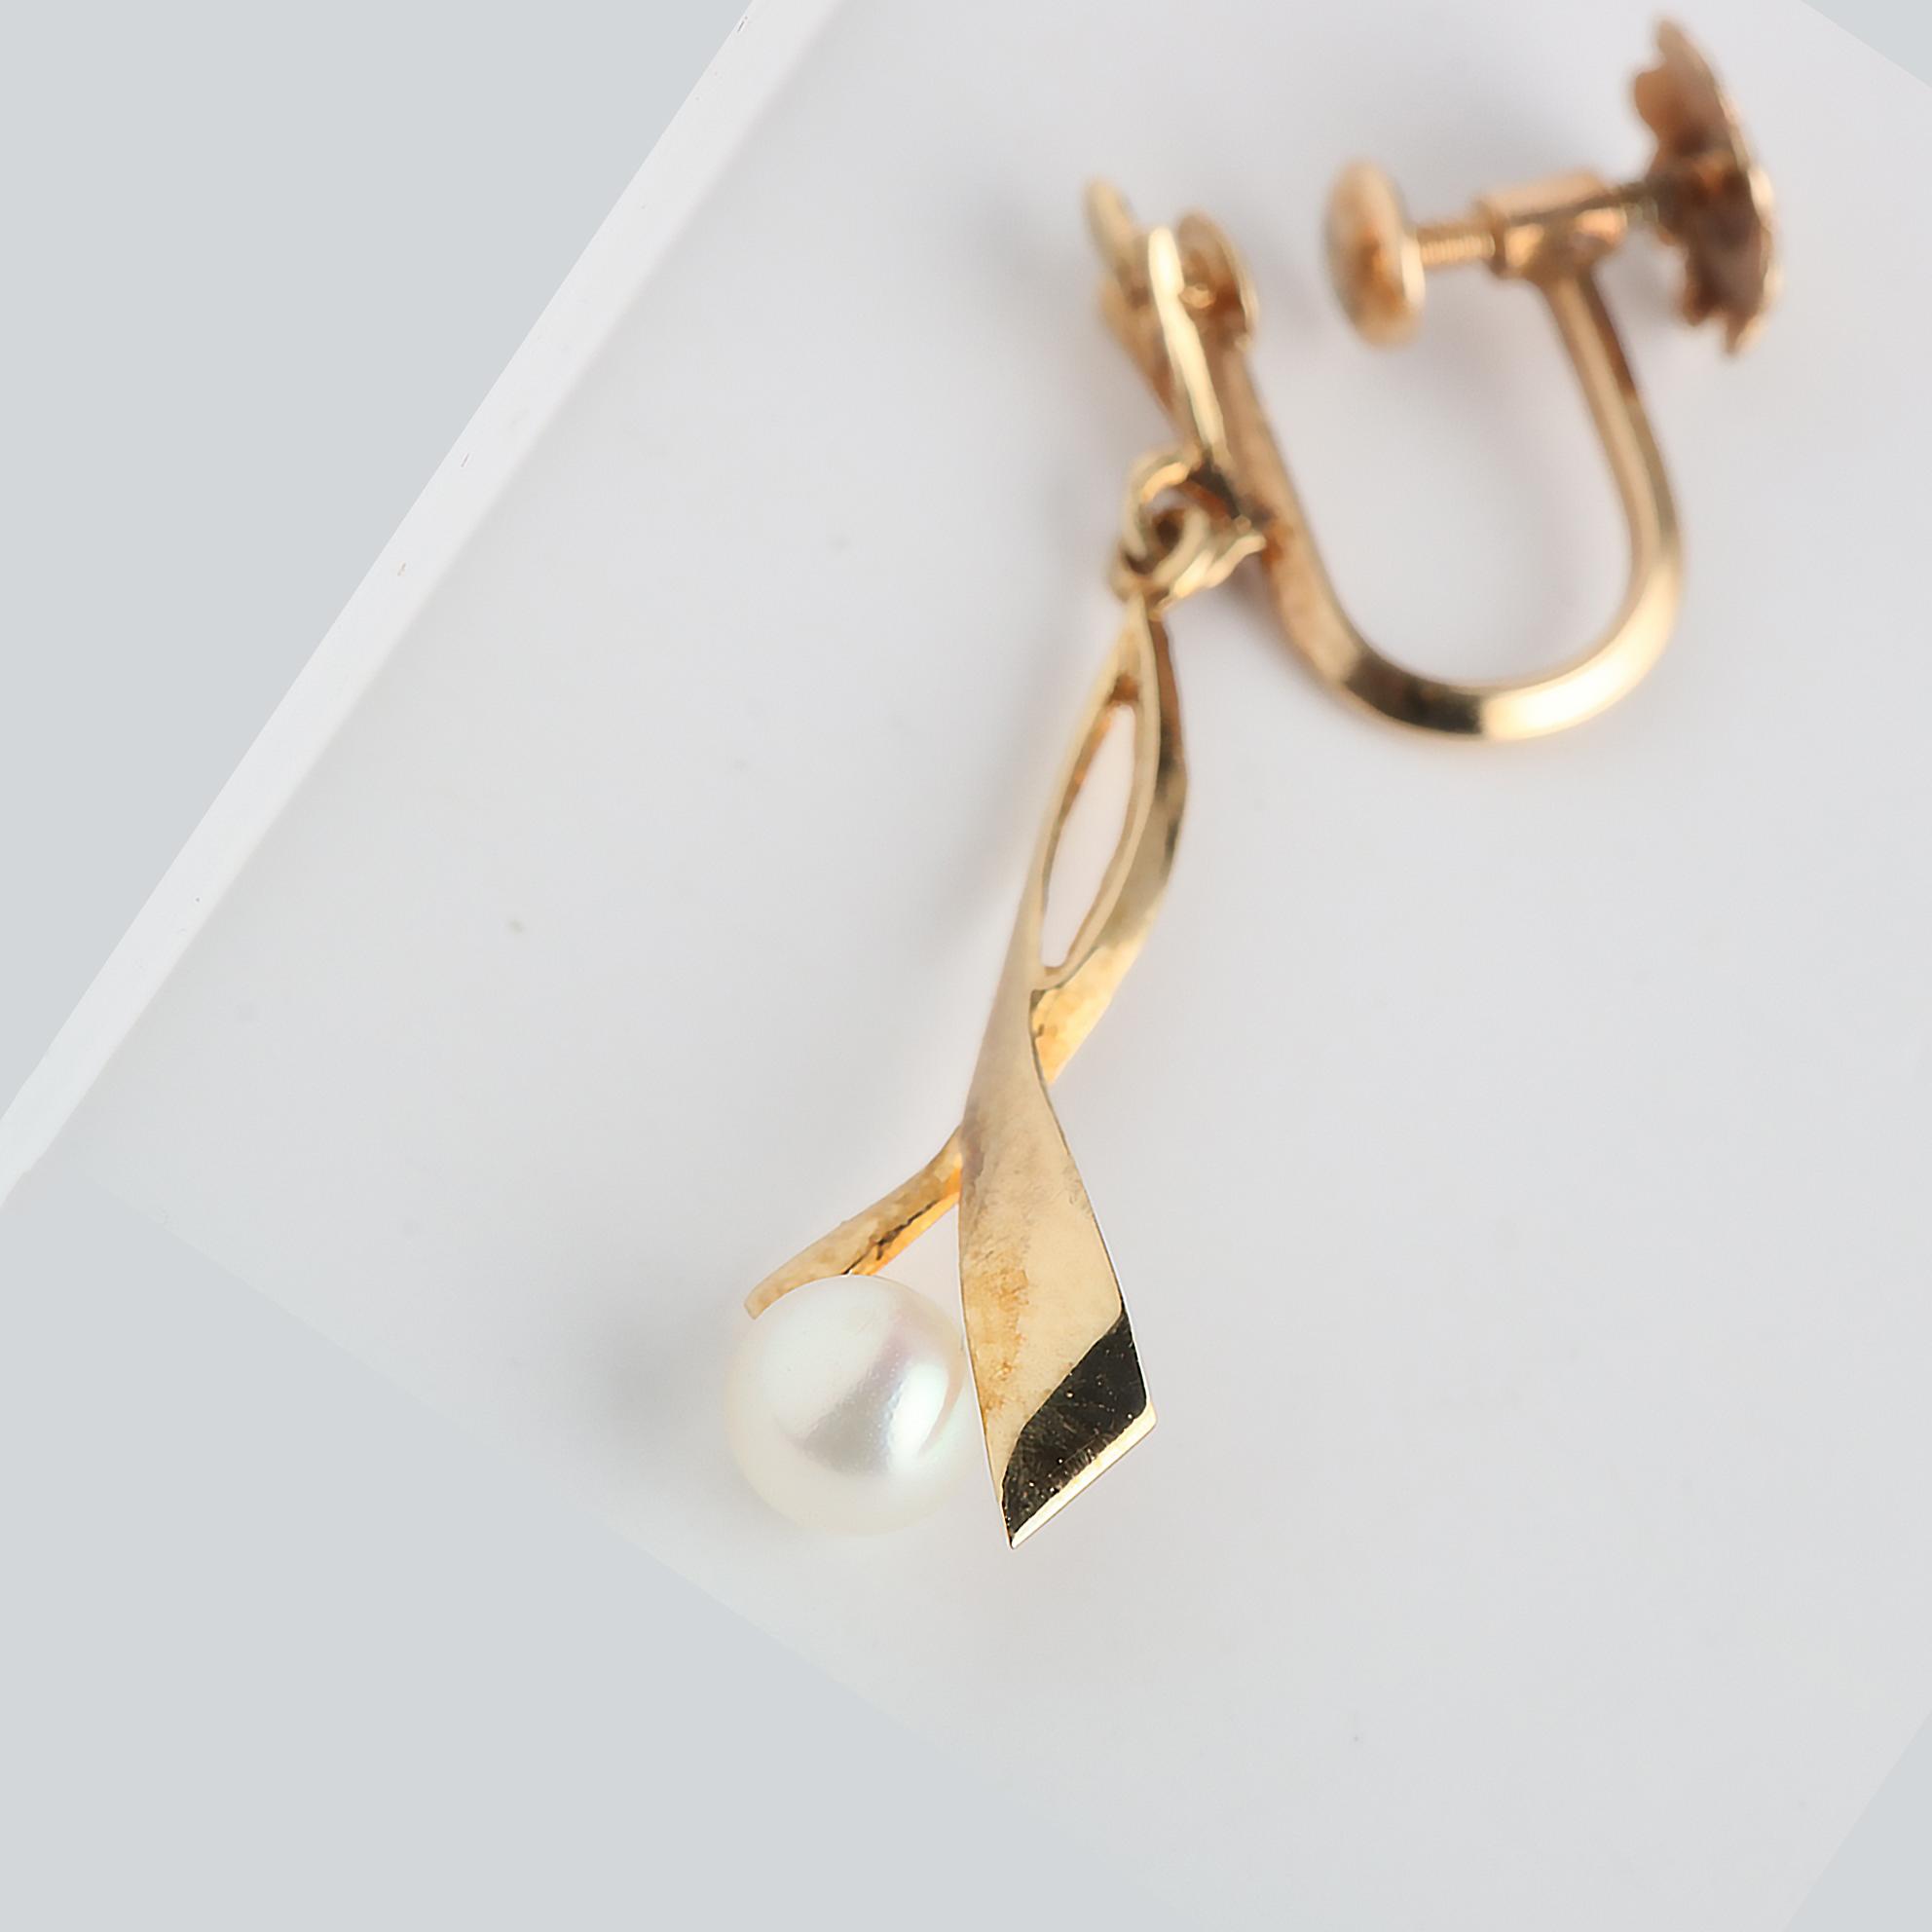 Ørepynt m. skru, gult gull, perle